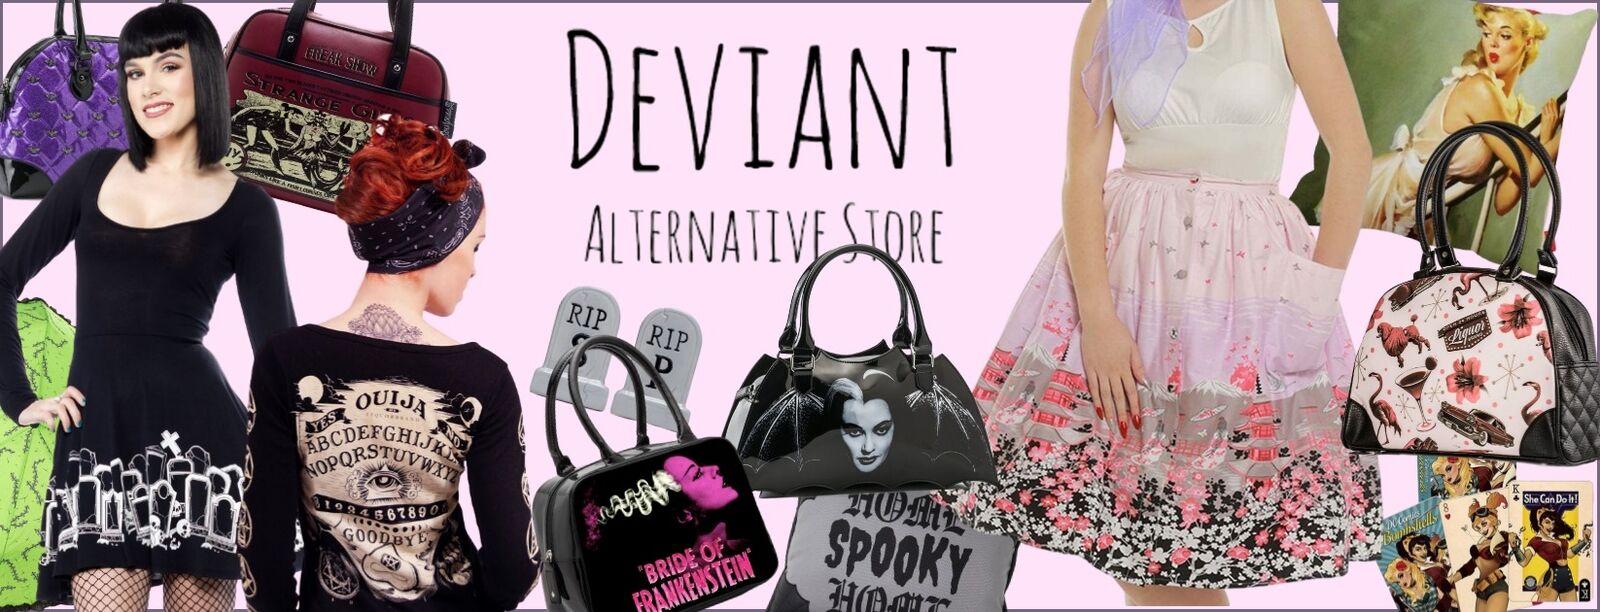 Deviant Alternative Store